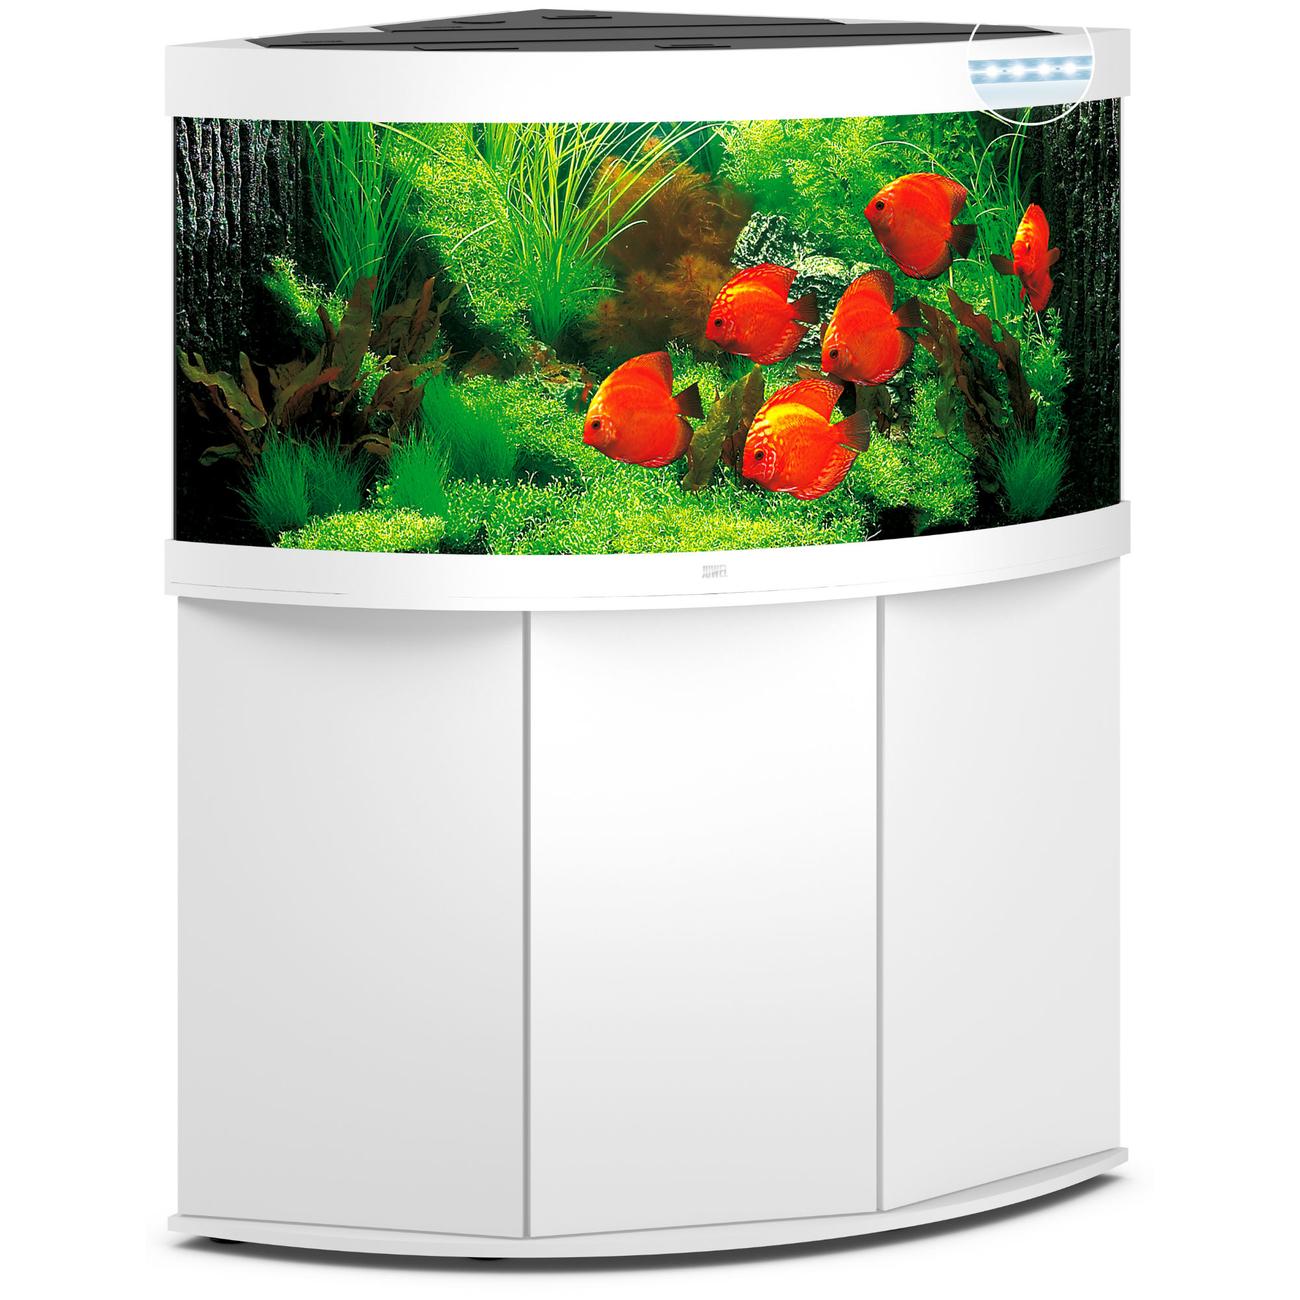 Juwel Trigon 350 LED Eck-Aquarium mit Unterschrank, Bild 7